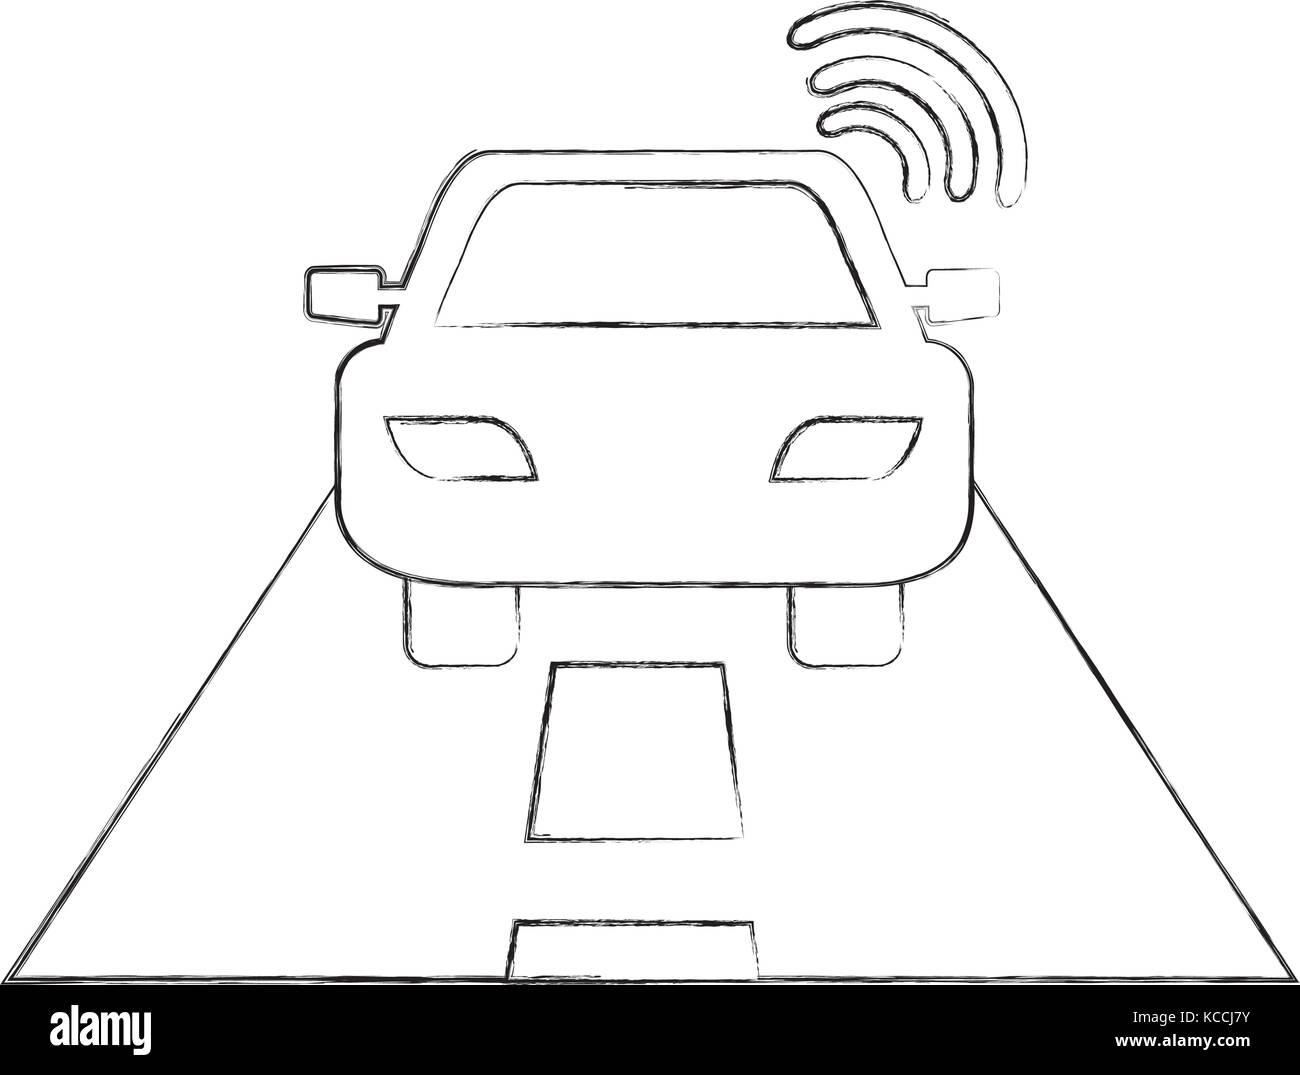 navigation gps signal street car transportation - Stock Image